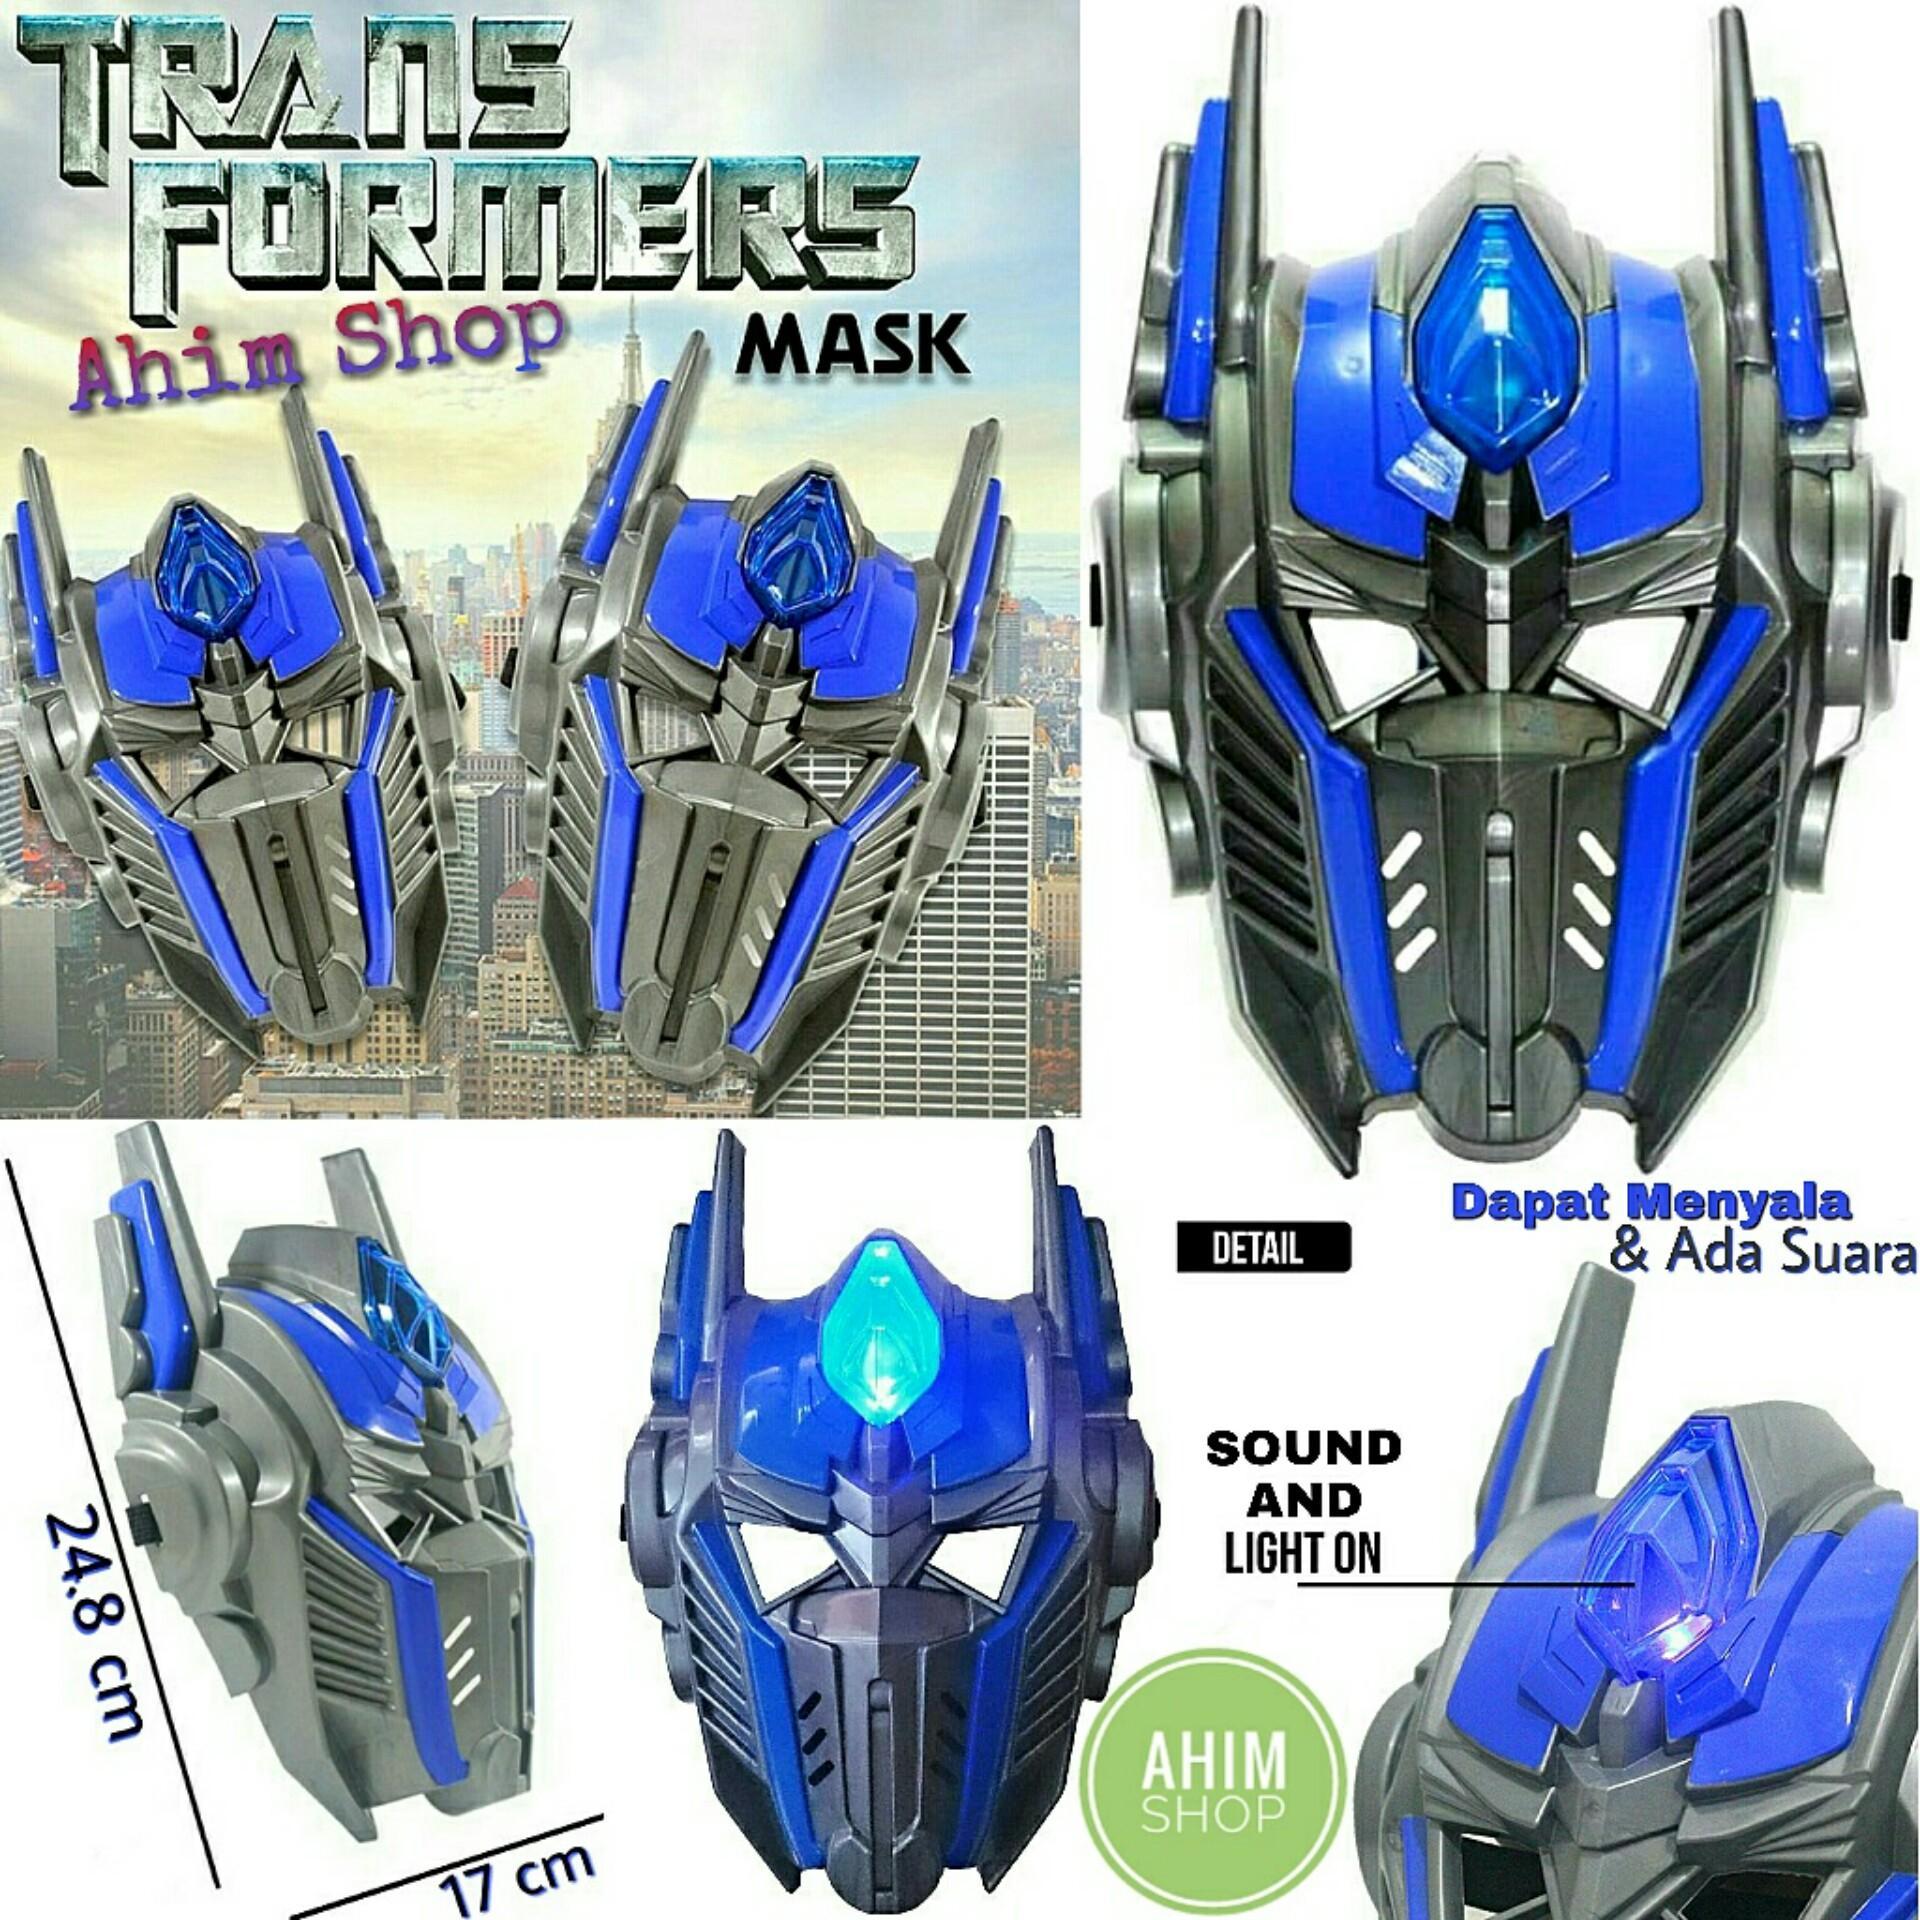 AHIM Topeng Transformers Robot Optimus Prime Sound And Light Superhero LED Mask